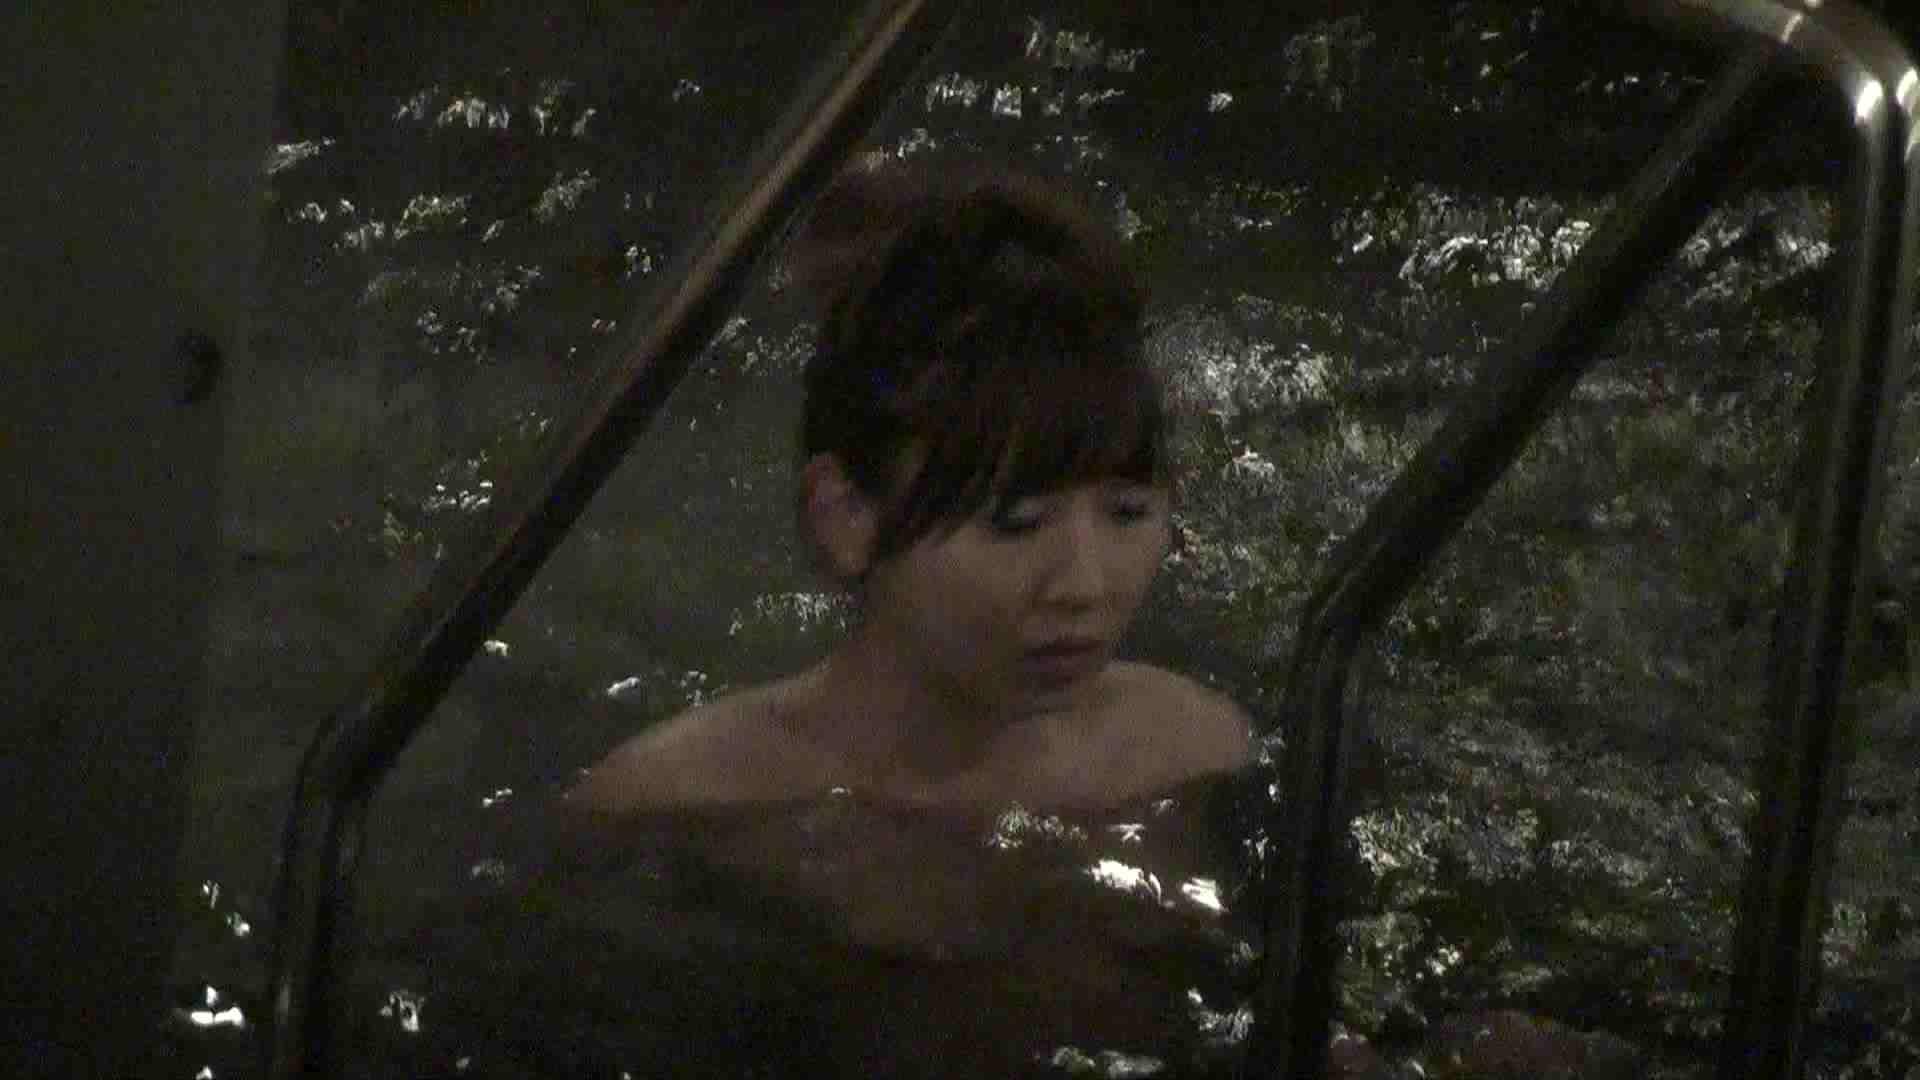 Aquaな露天風呂Vol.410 盗撮  73連発 65